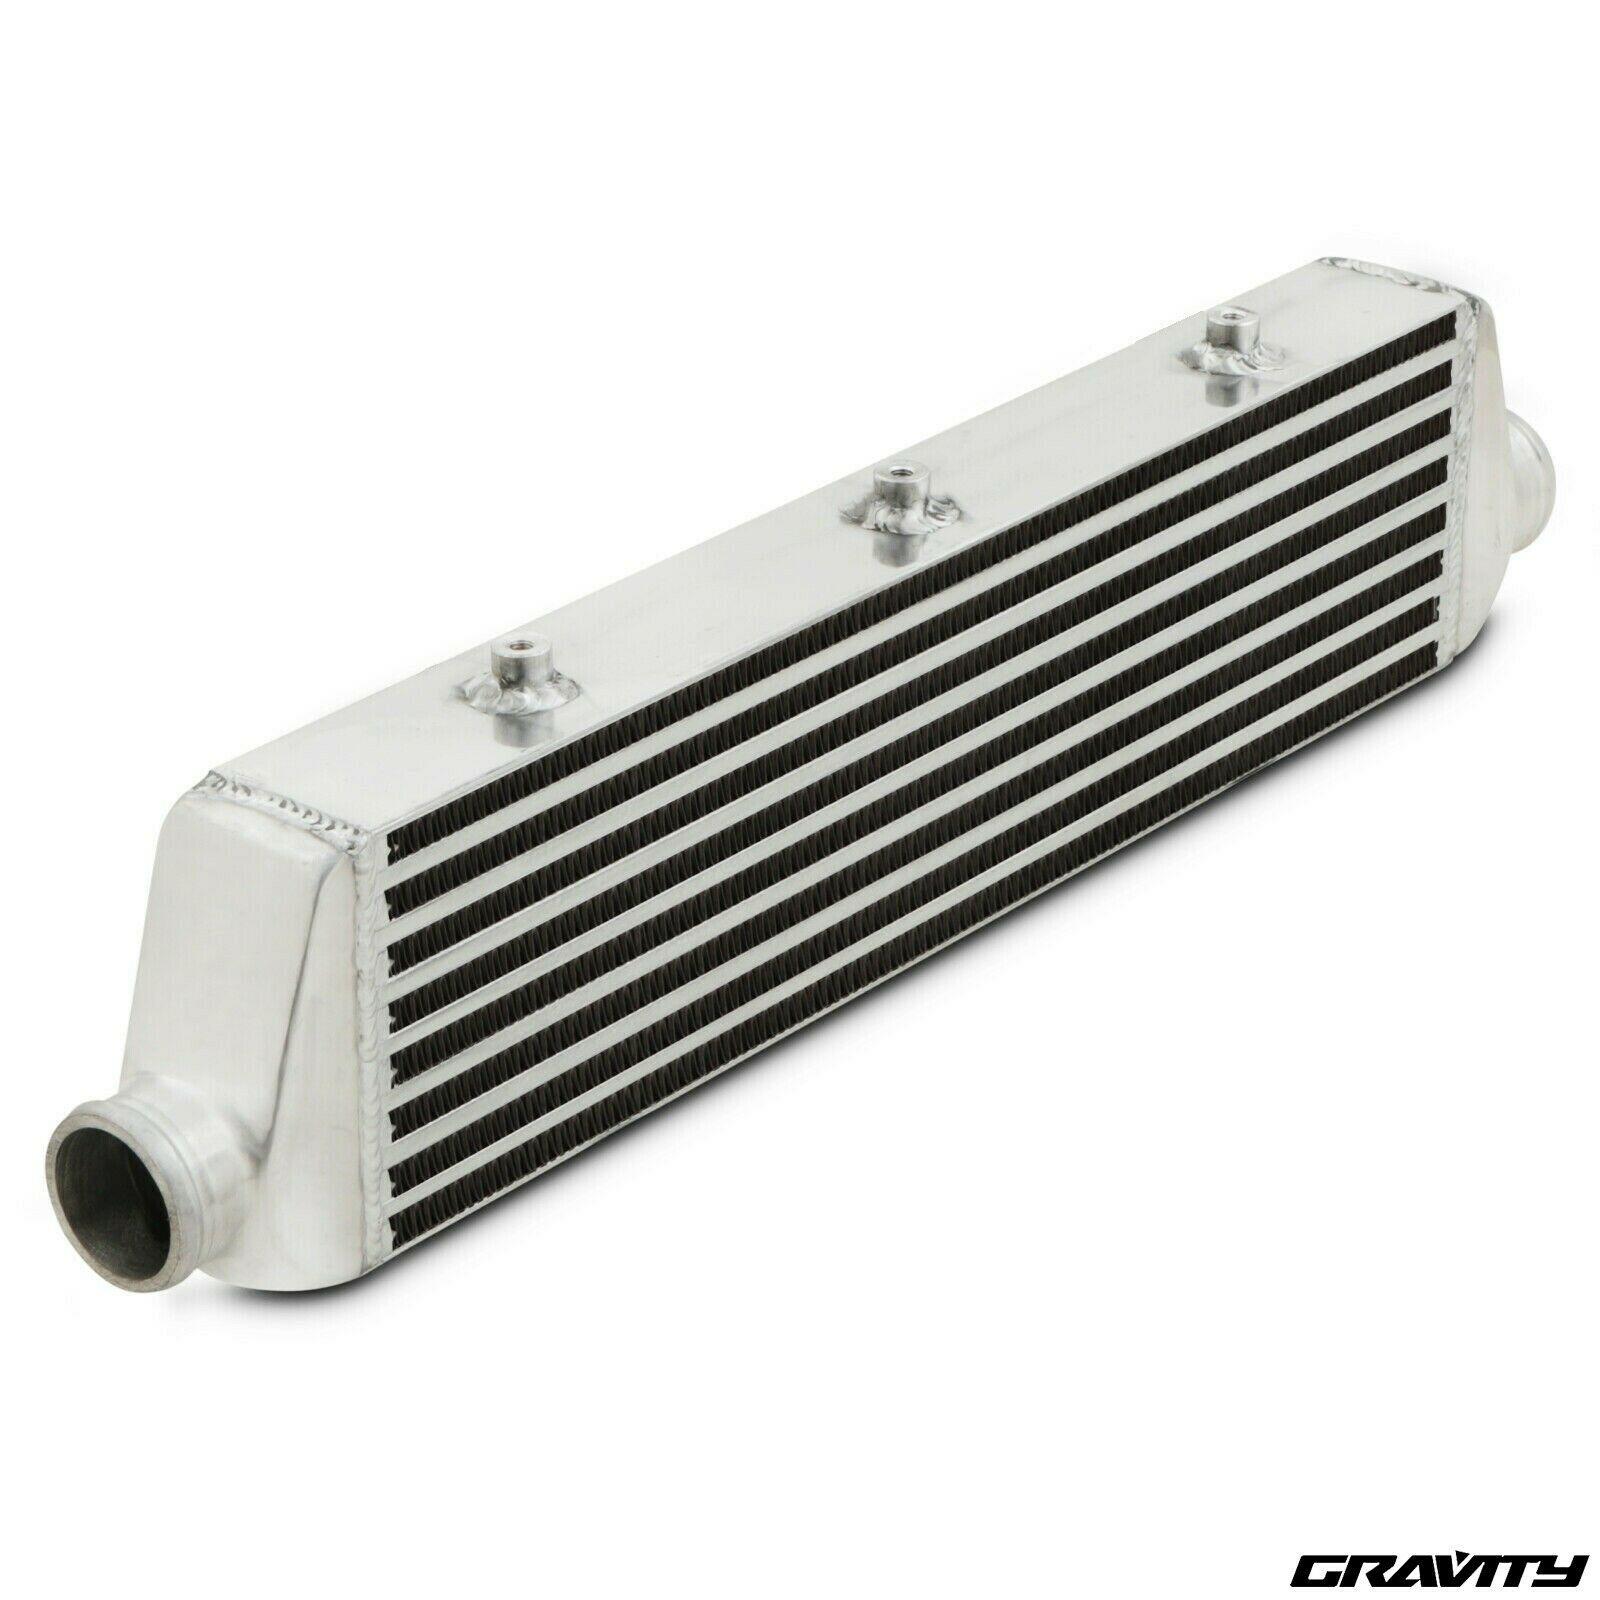 550x140x65mm intercooler (Civic, Swift, Astra, Calibra, VW 1.9 TDi) 57mm csatlakozásokkal MGP Racing